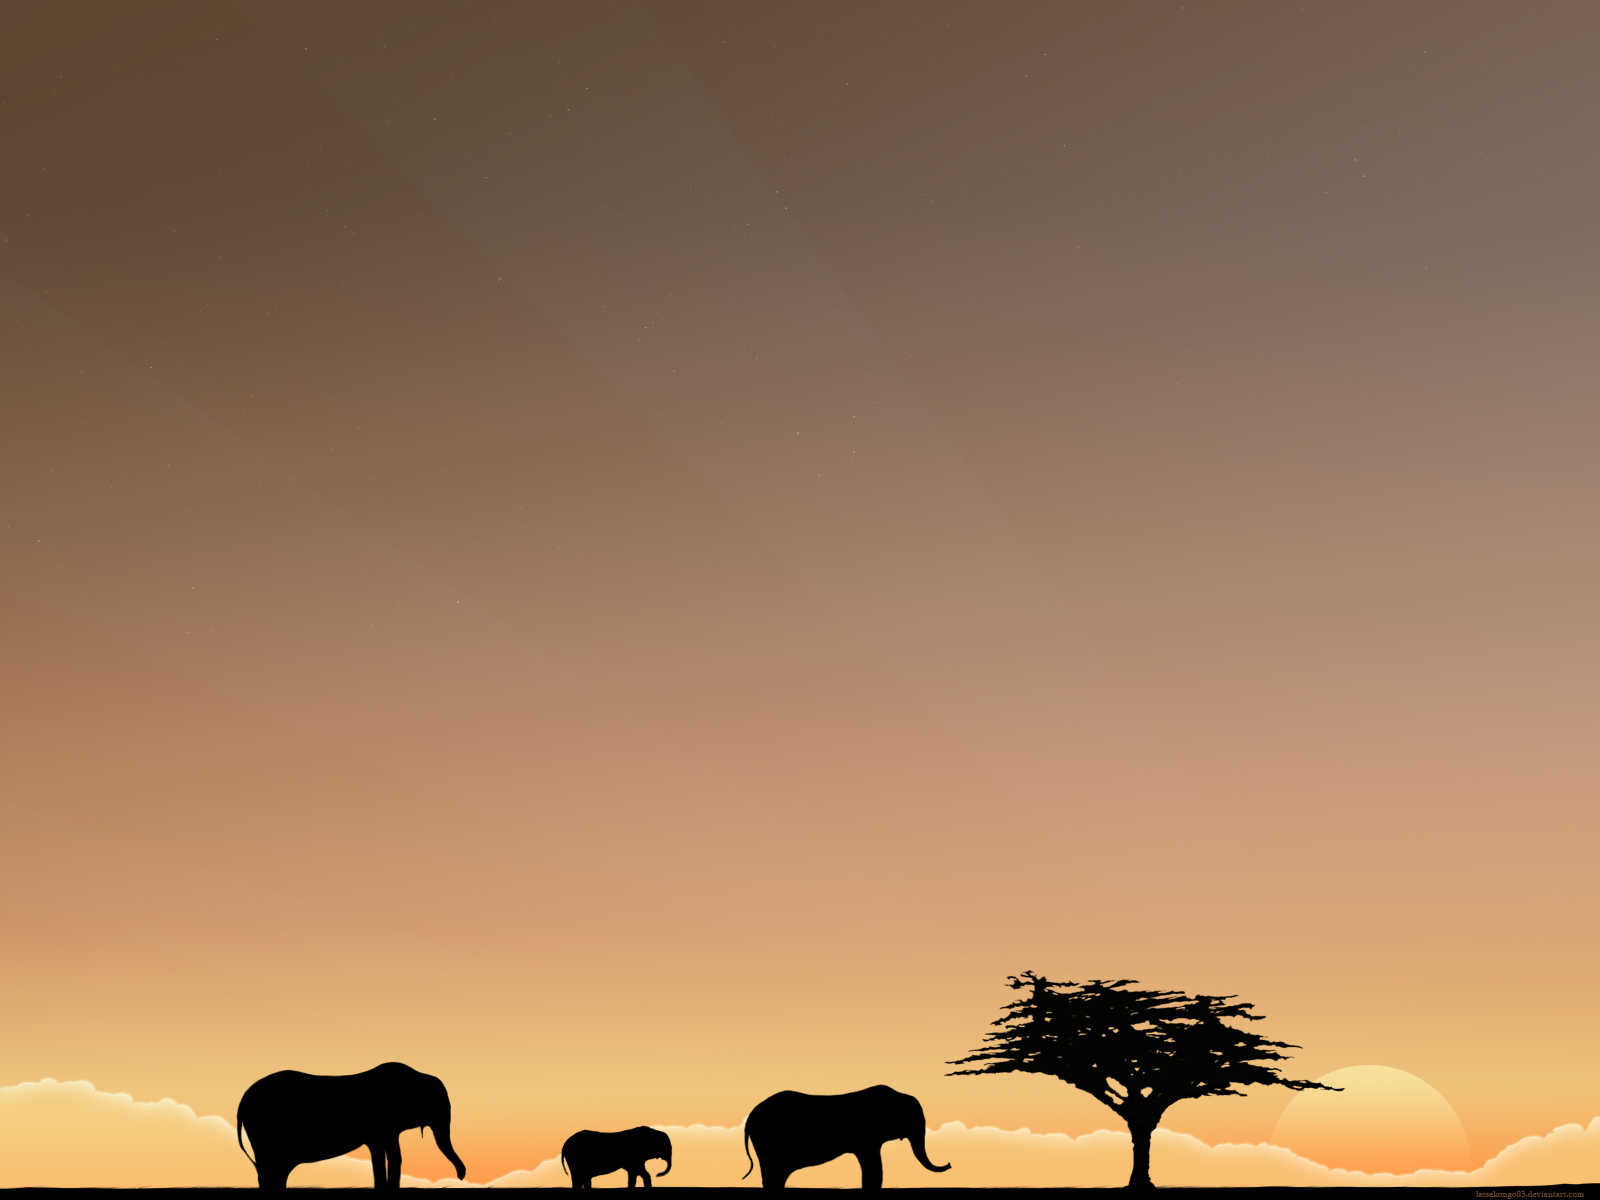 The Elephants Trip by lassekongo83